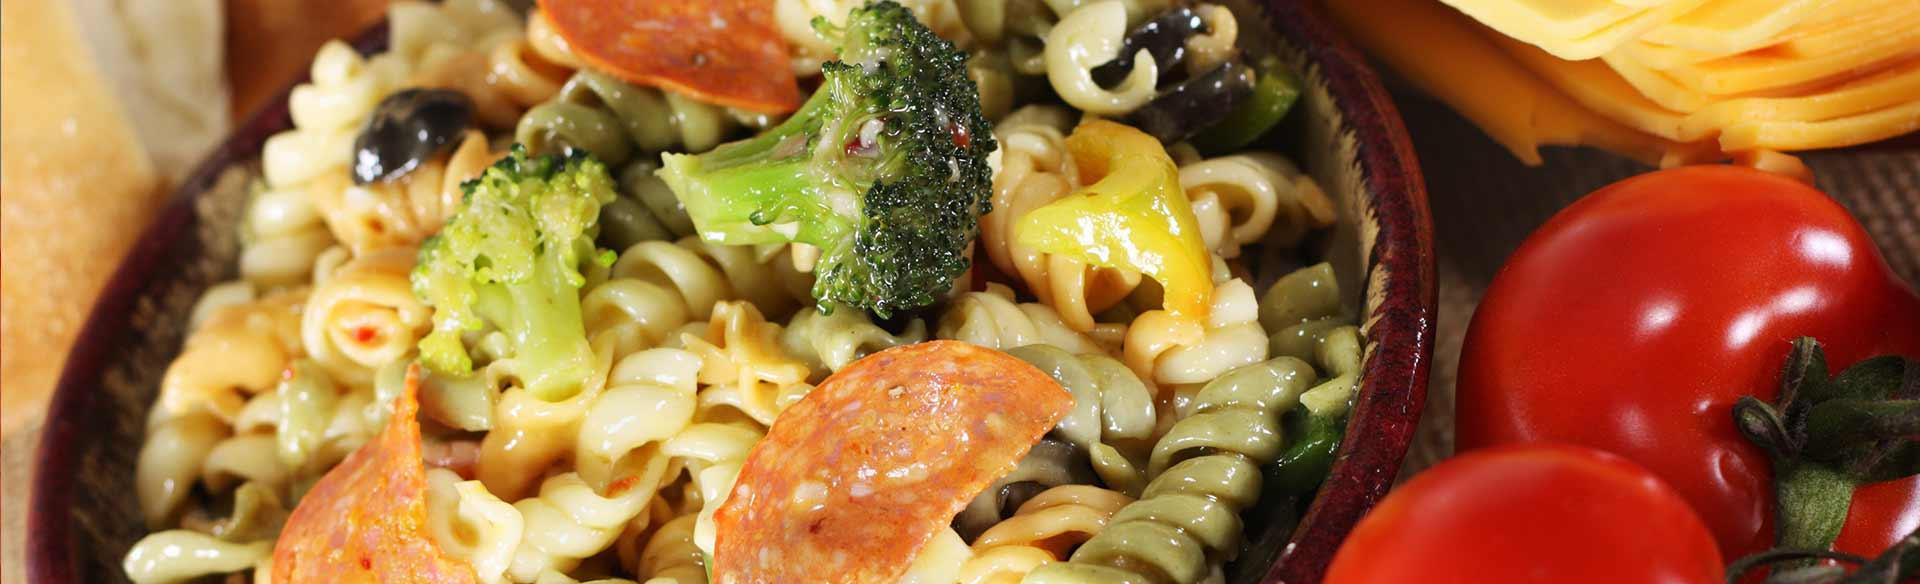 tri-colored-rotini-pasta-salad